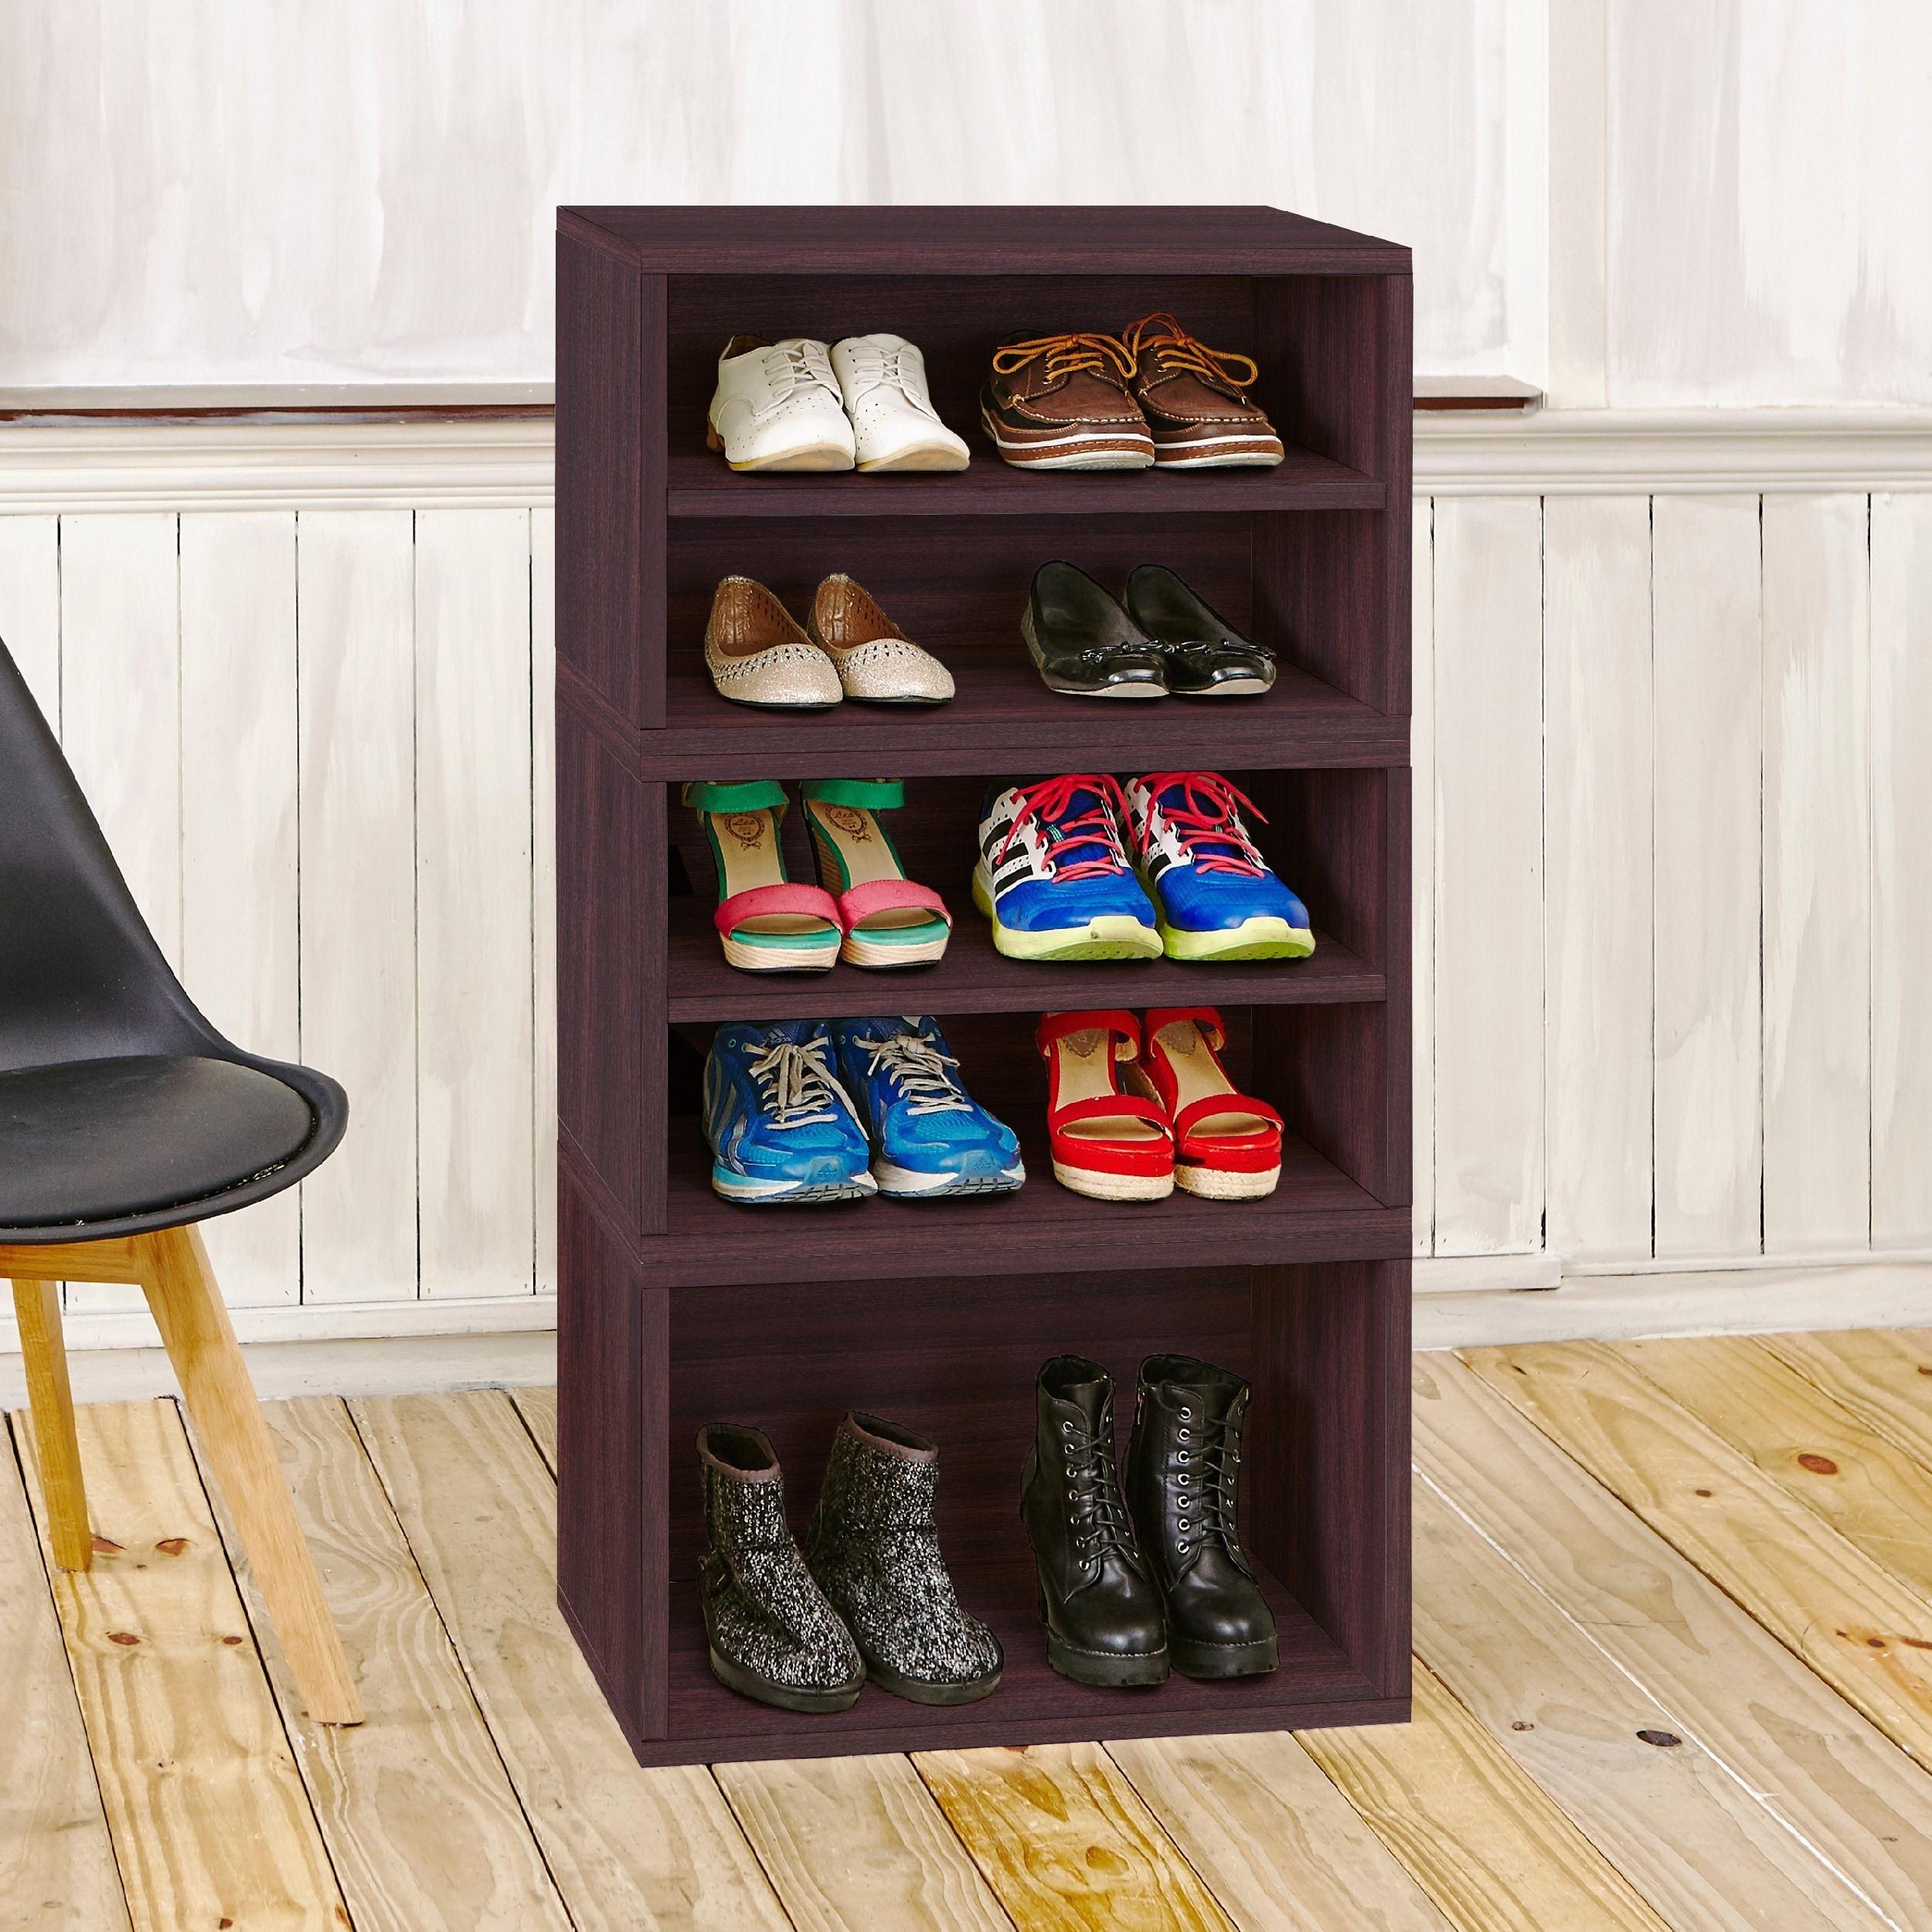 Shop Pisa Modular Storage System Shoe Rack Bookcase Shelving By Way Basics  LIFETIME GUARANTEE   Free Shipping Today   Overstock.com   12244383